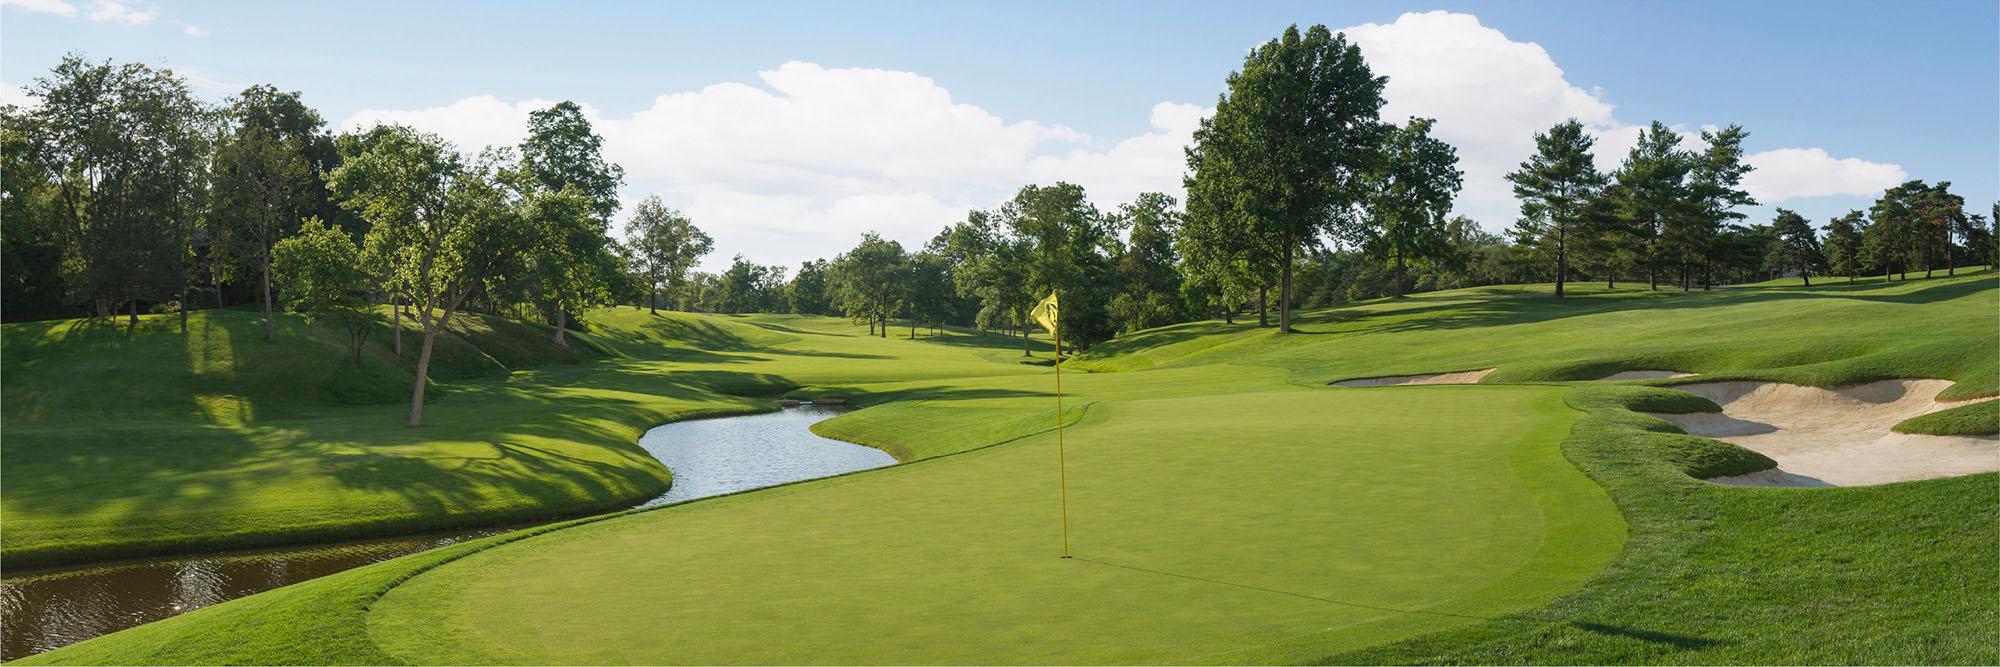 Golf Course Image - Muirfield Village No. 14